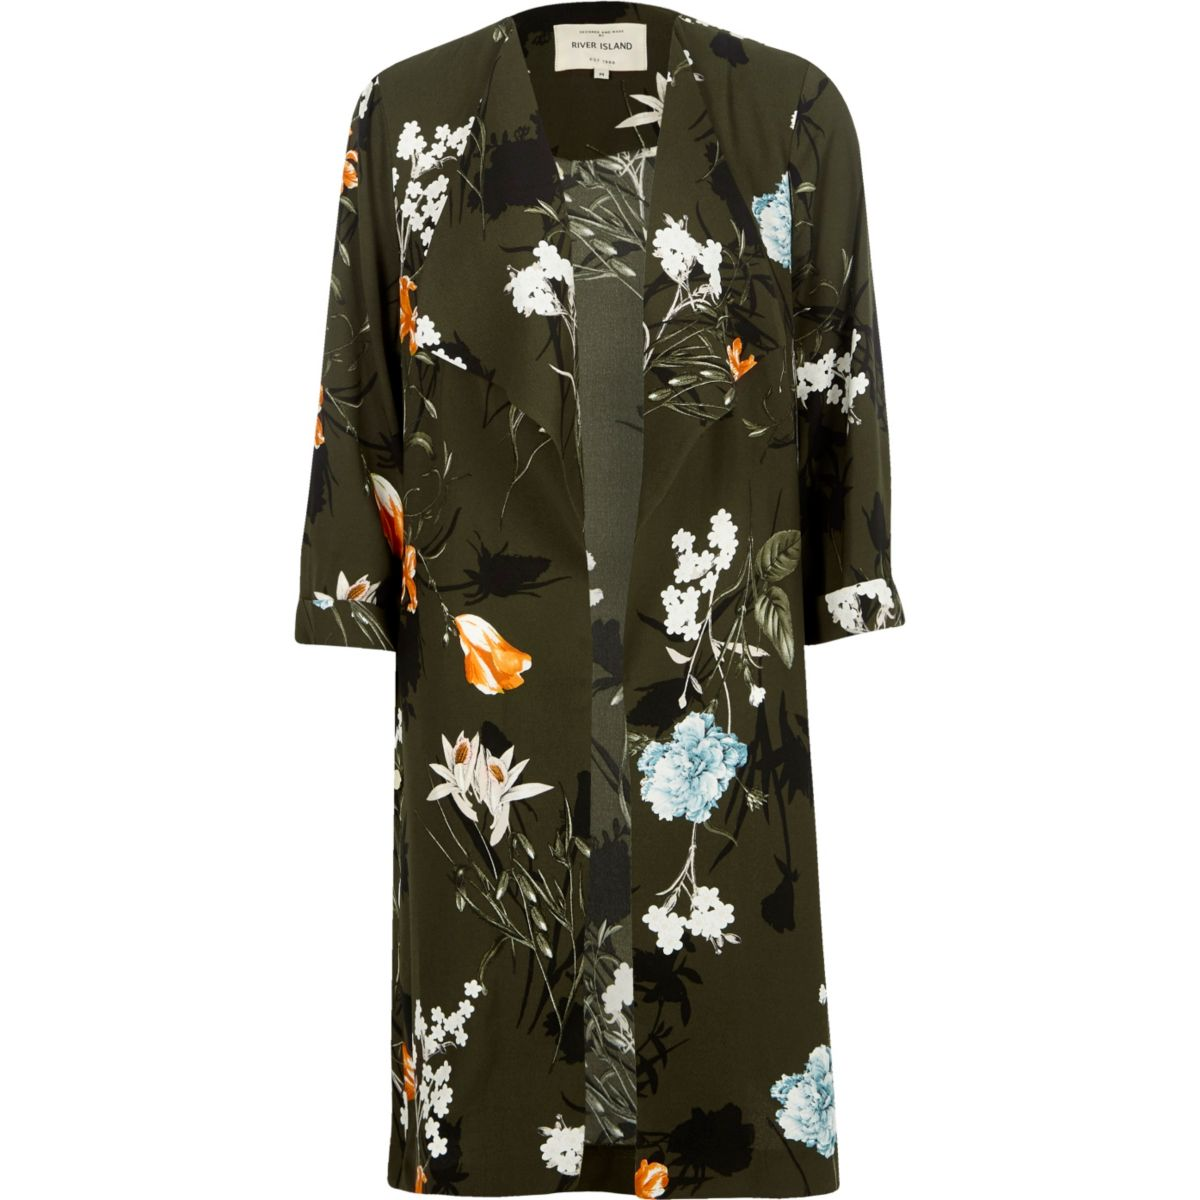 Khaki green floral print duster coat